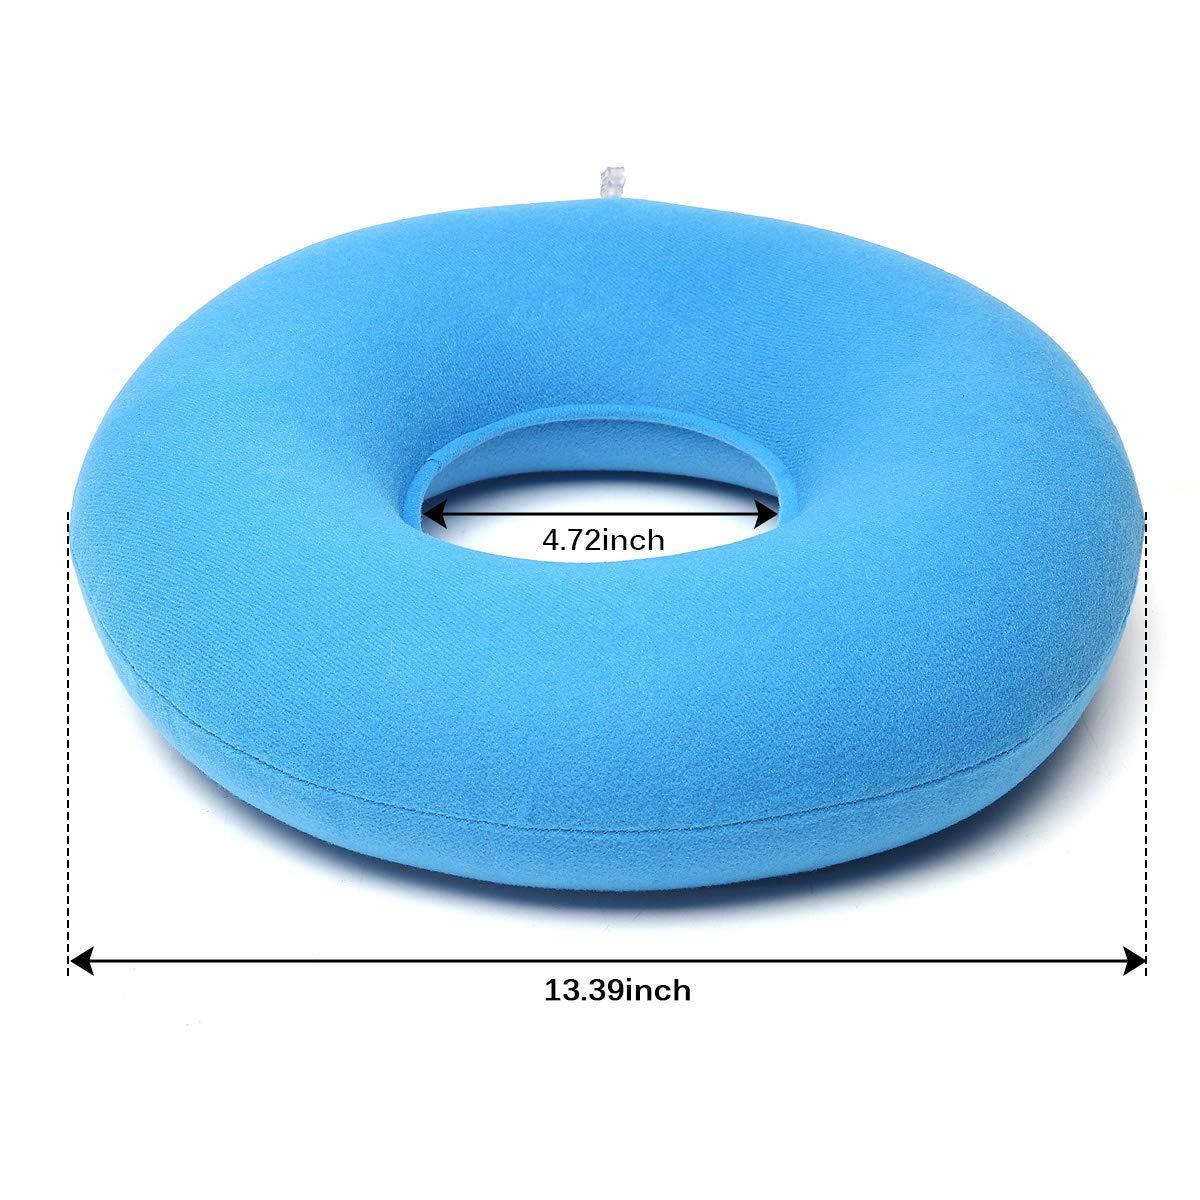 Amazon.com: Cojín Donut de 13.0 in Inflable Anillo ...